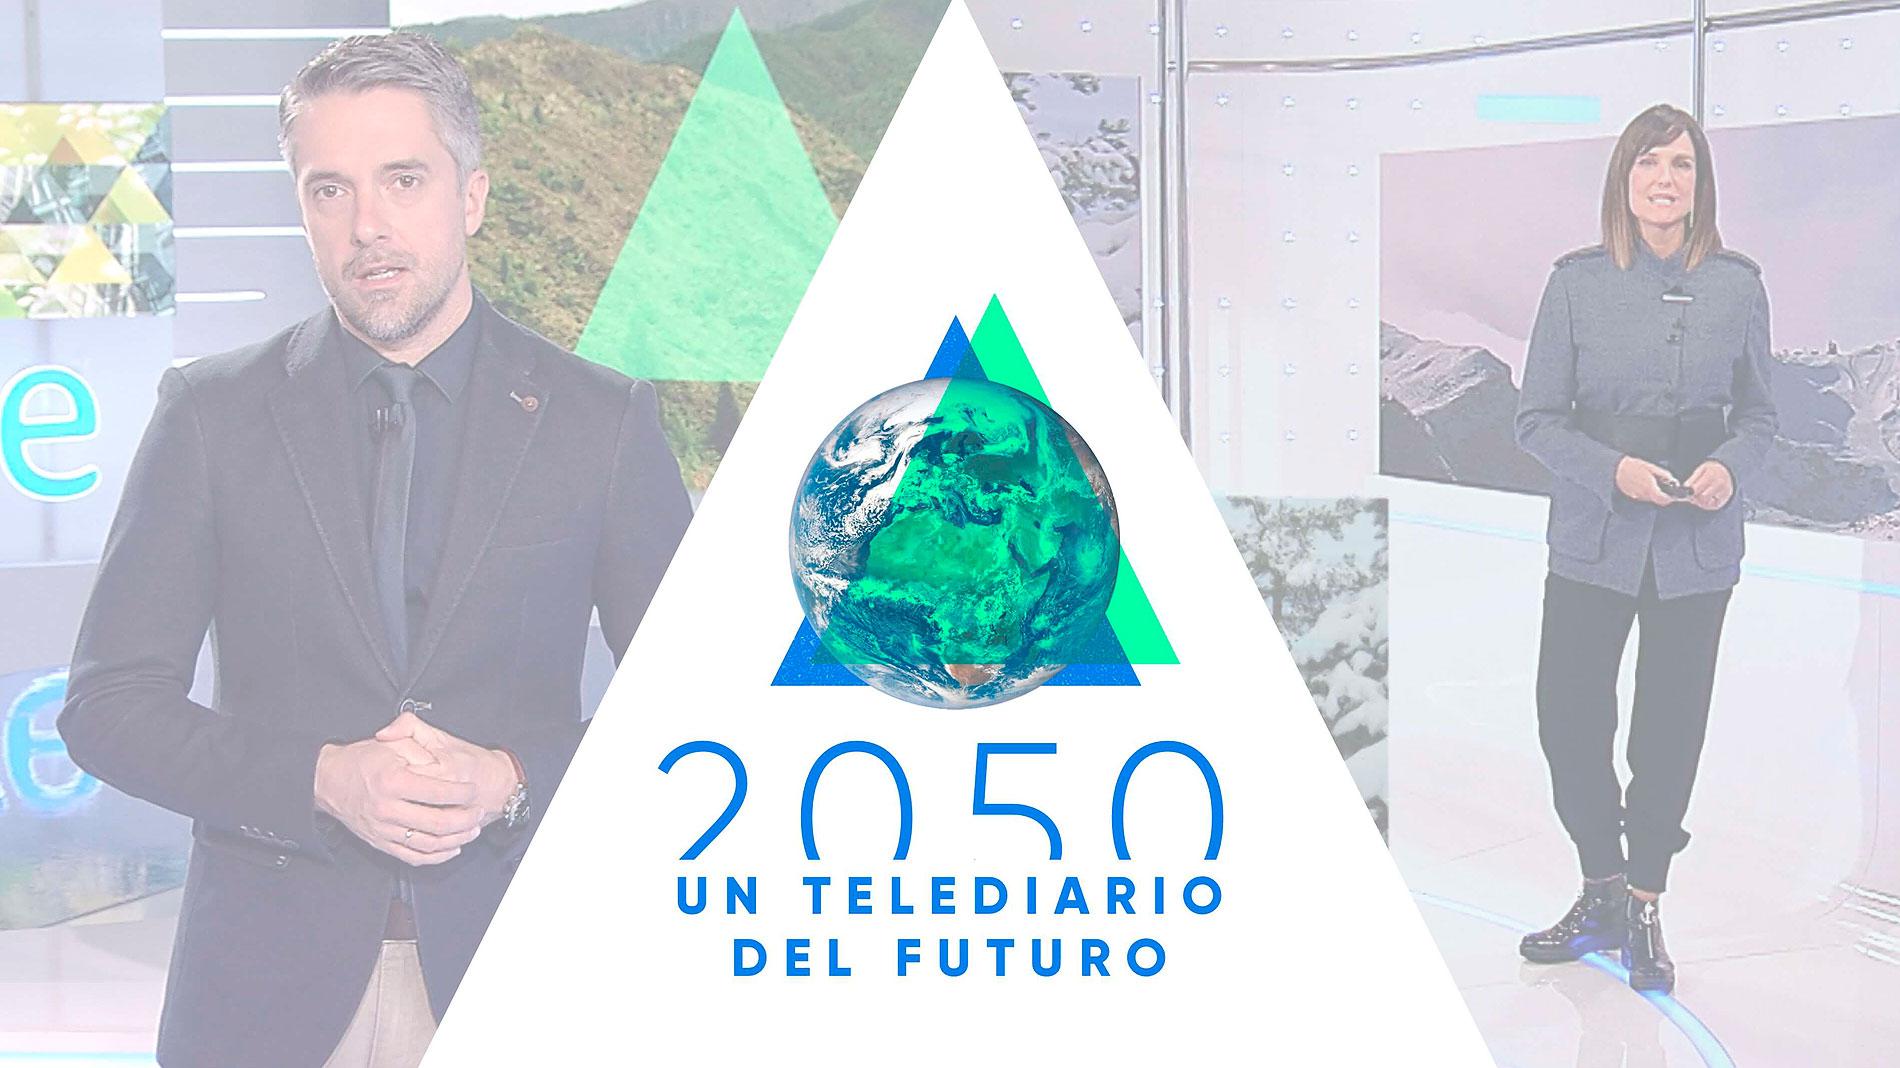 2050: Un Telediario de futuro